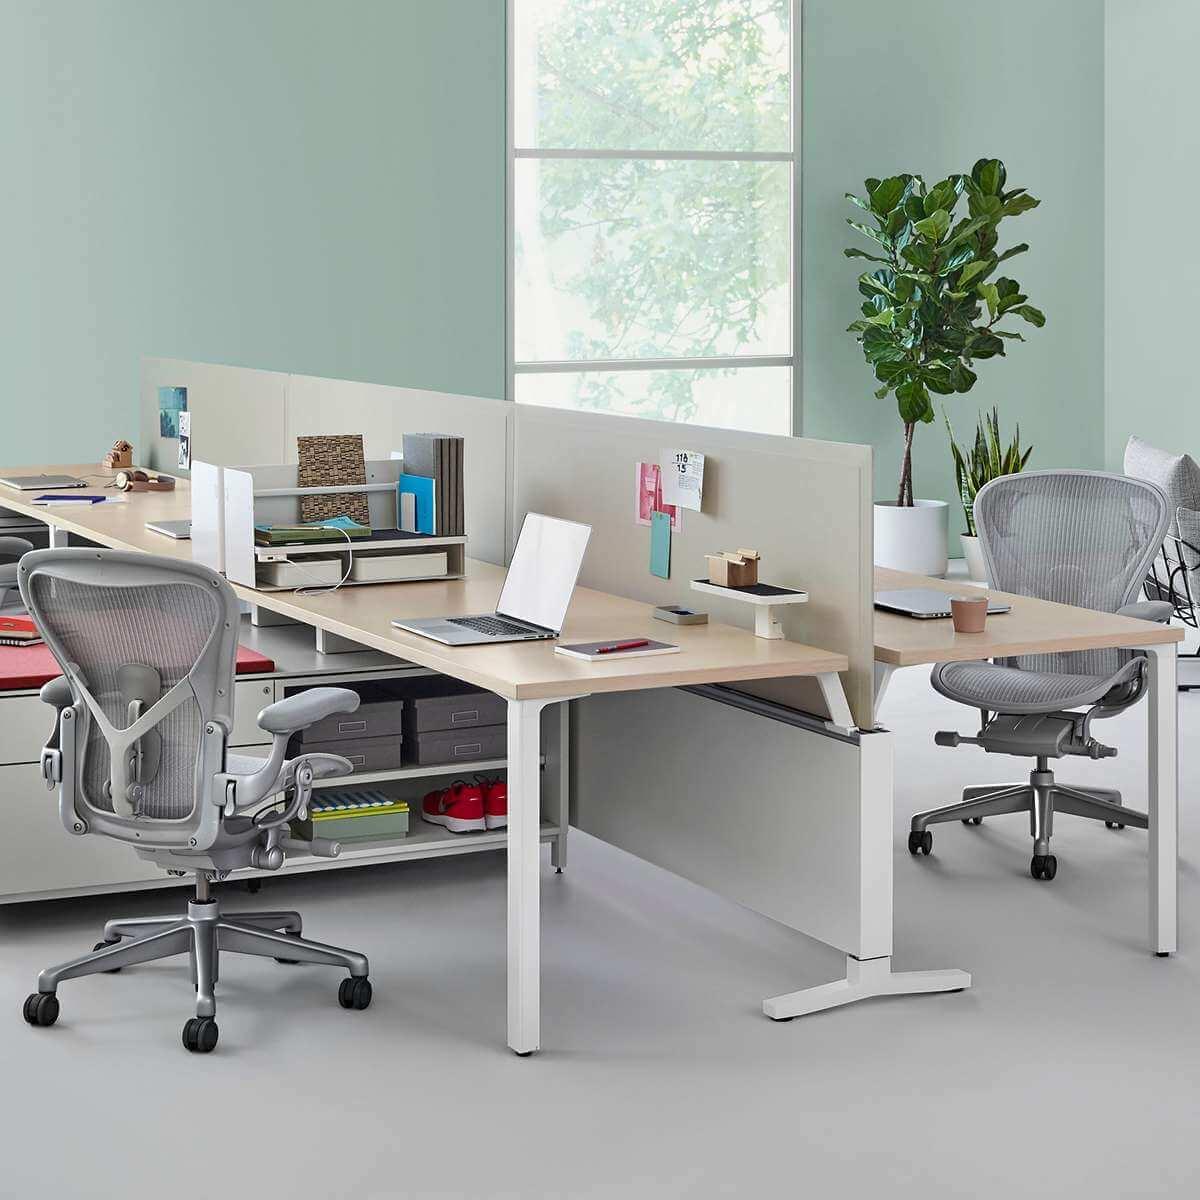 Ergonomic Office Chair 6